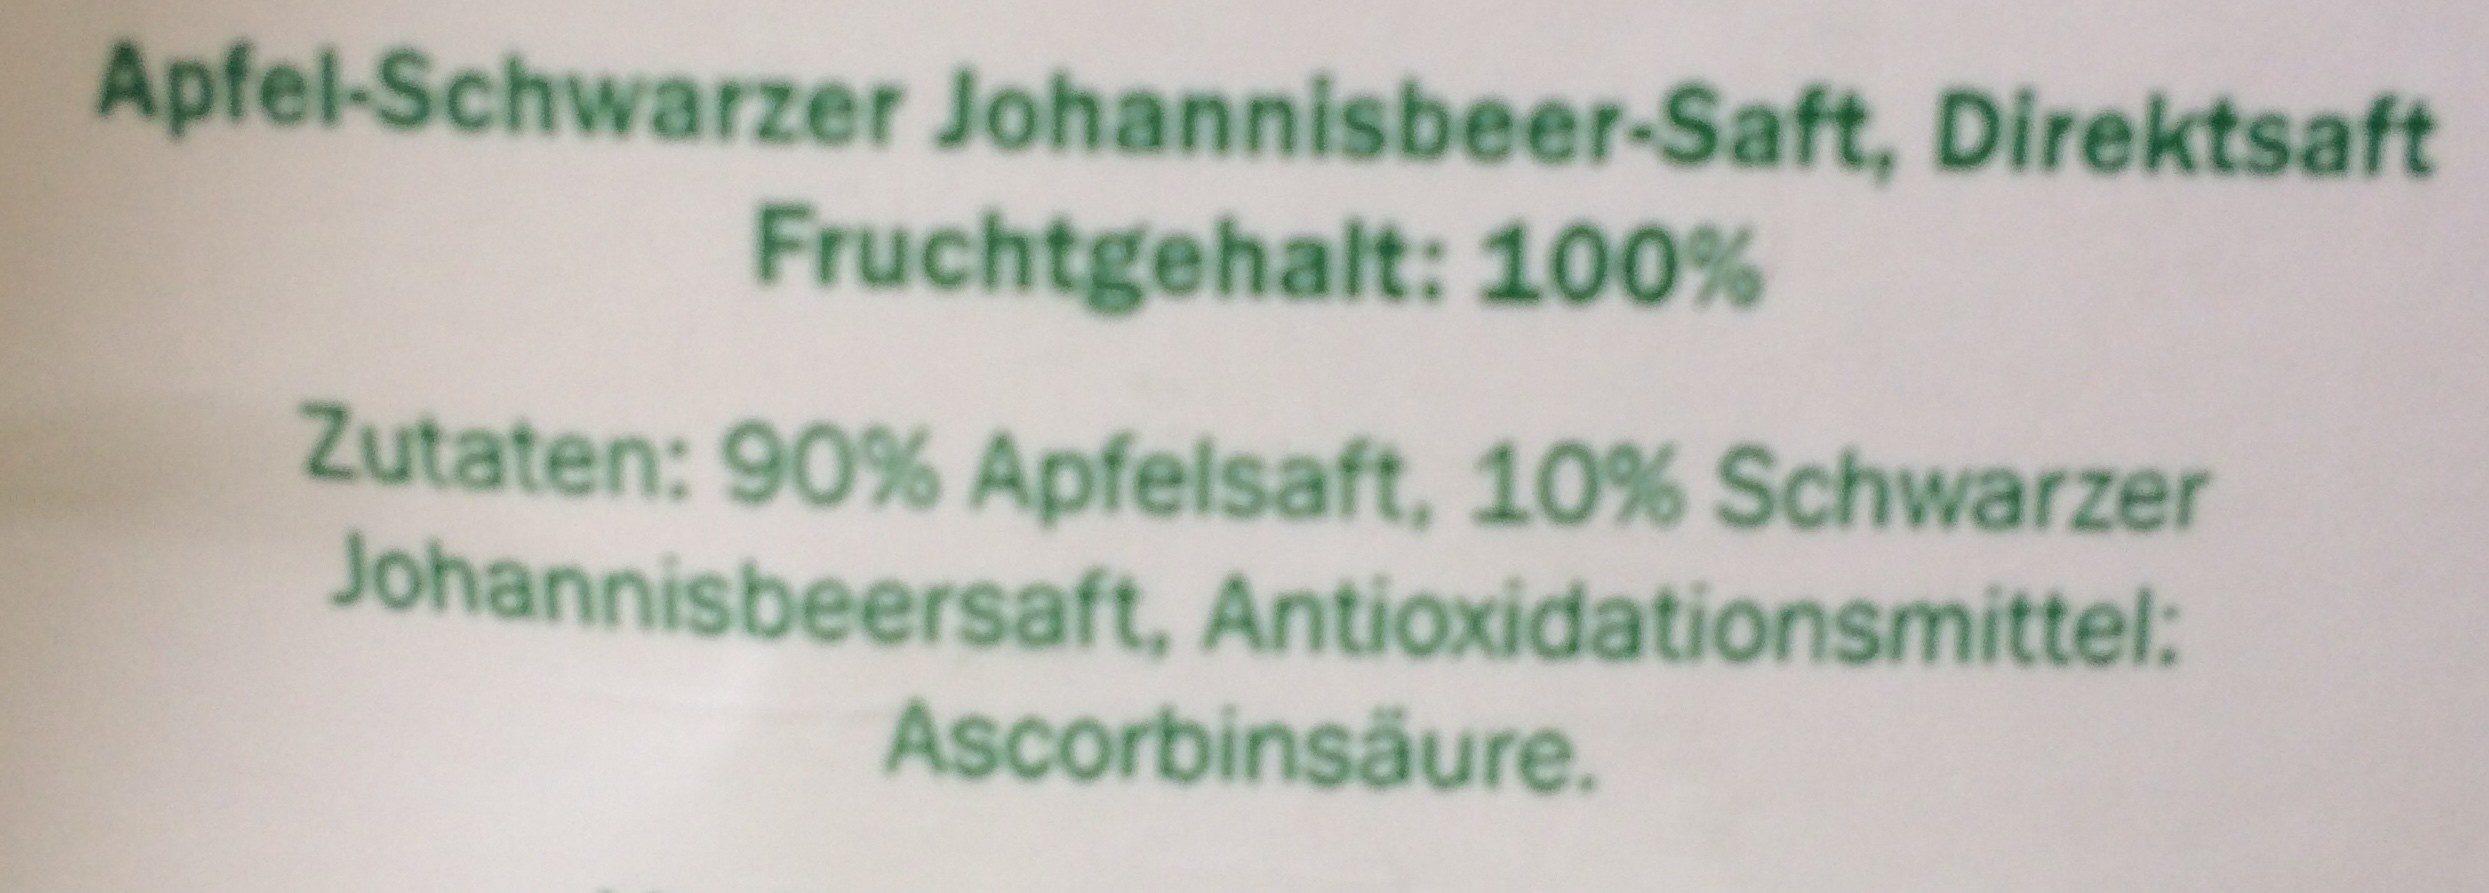 Apfel-Johannisbeersaft - Ingrédients - fr